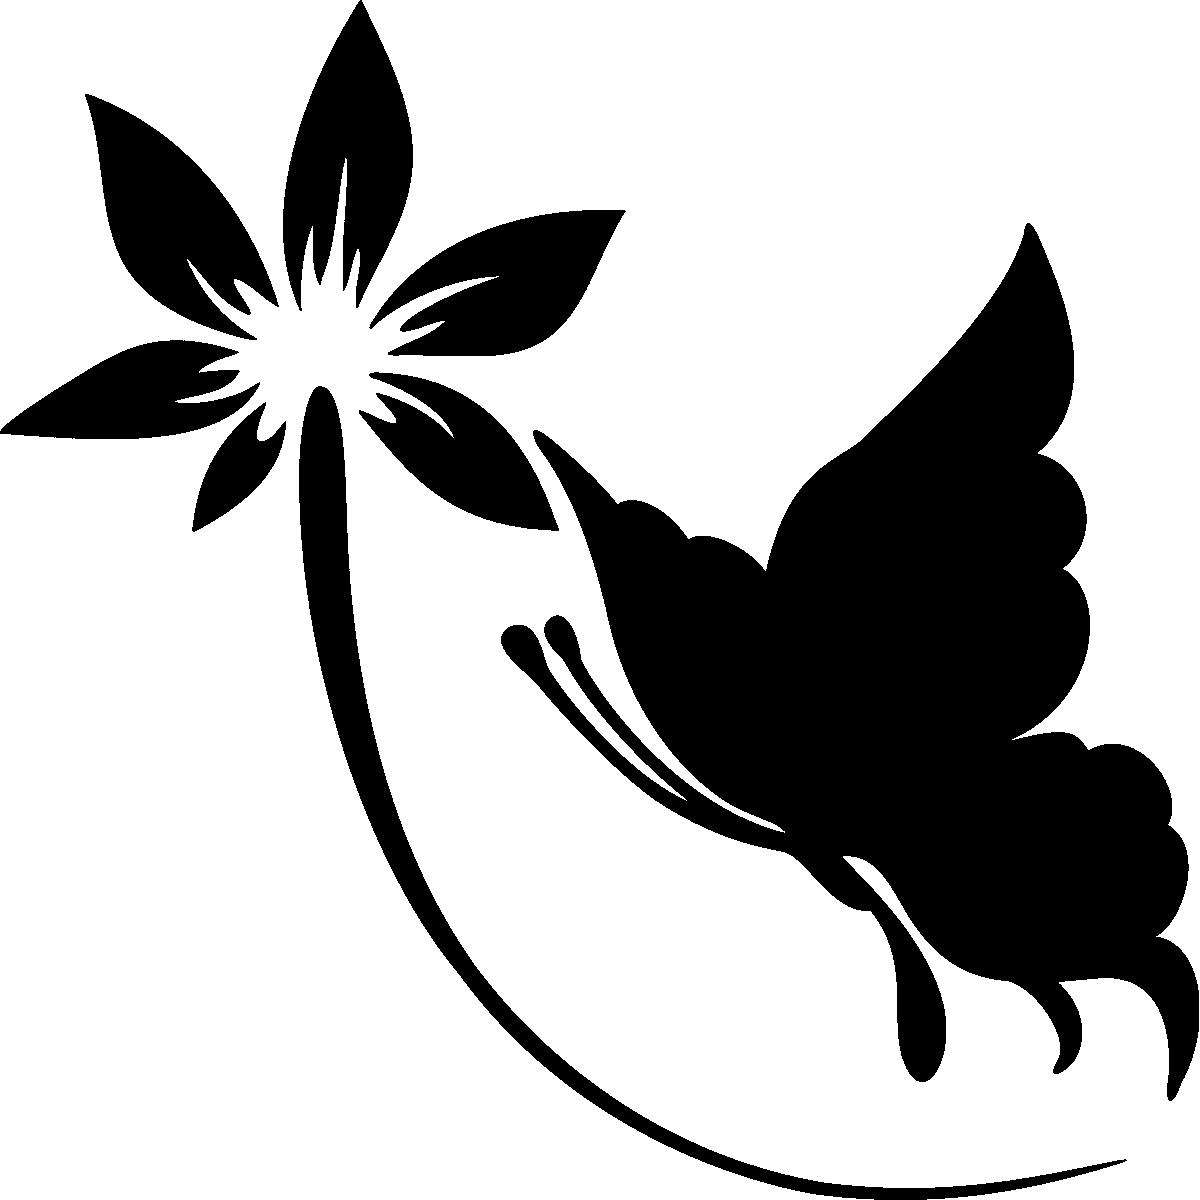 Muurstickers dieren muursticker bloem en vlinder ambiance - Deco kamer stijl engels ...